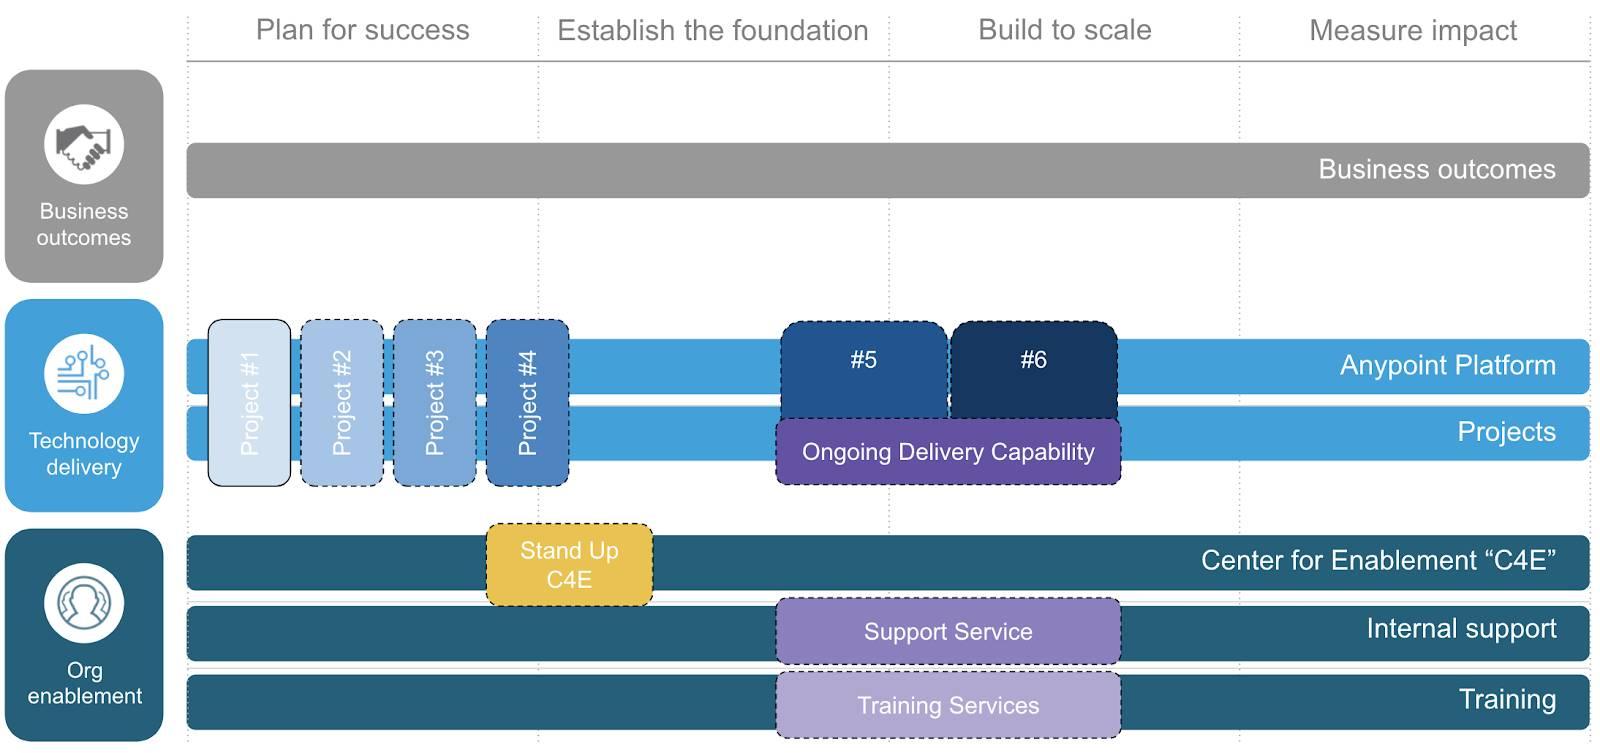 Partner engagement opportunities across all six paths